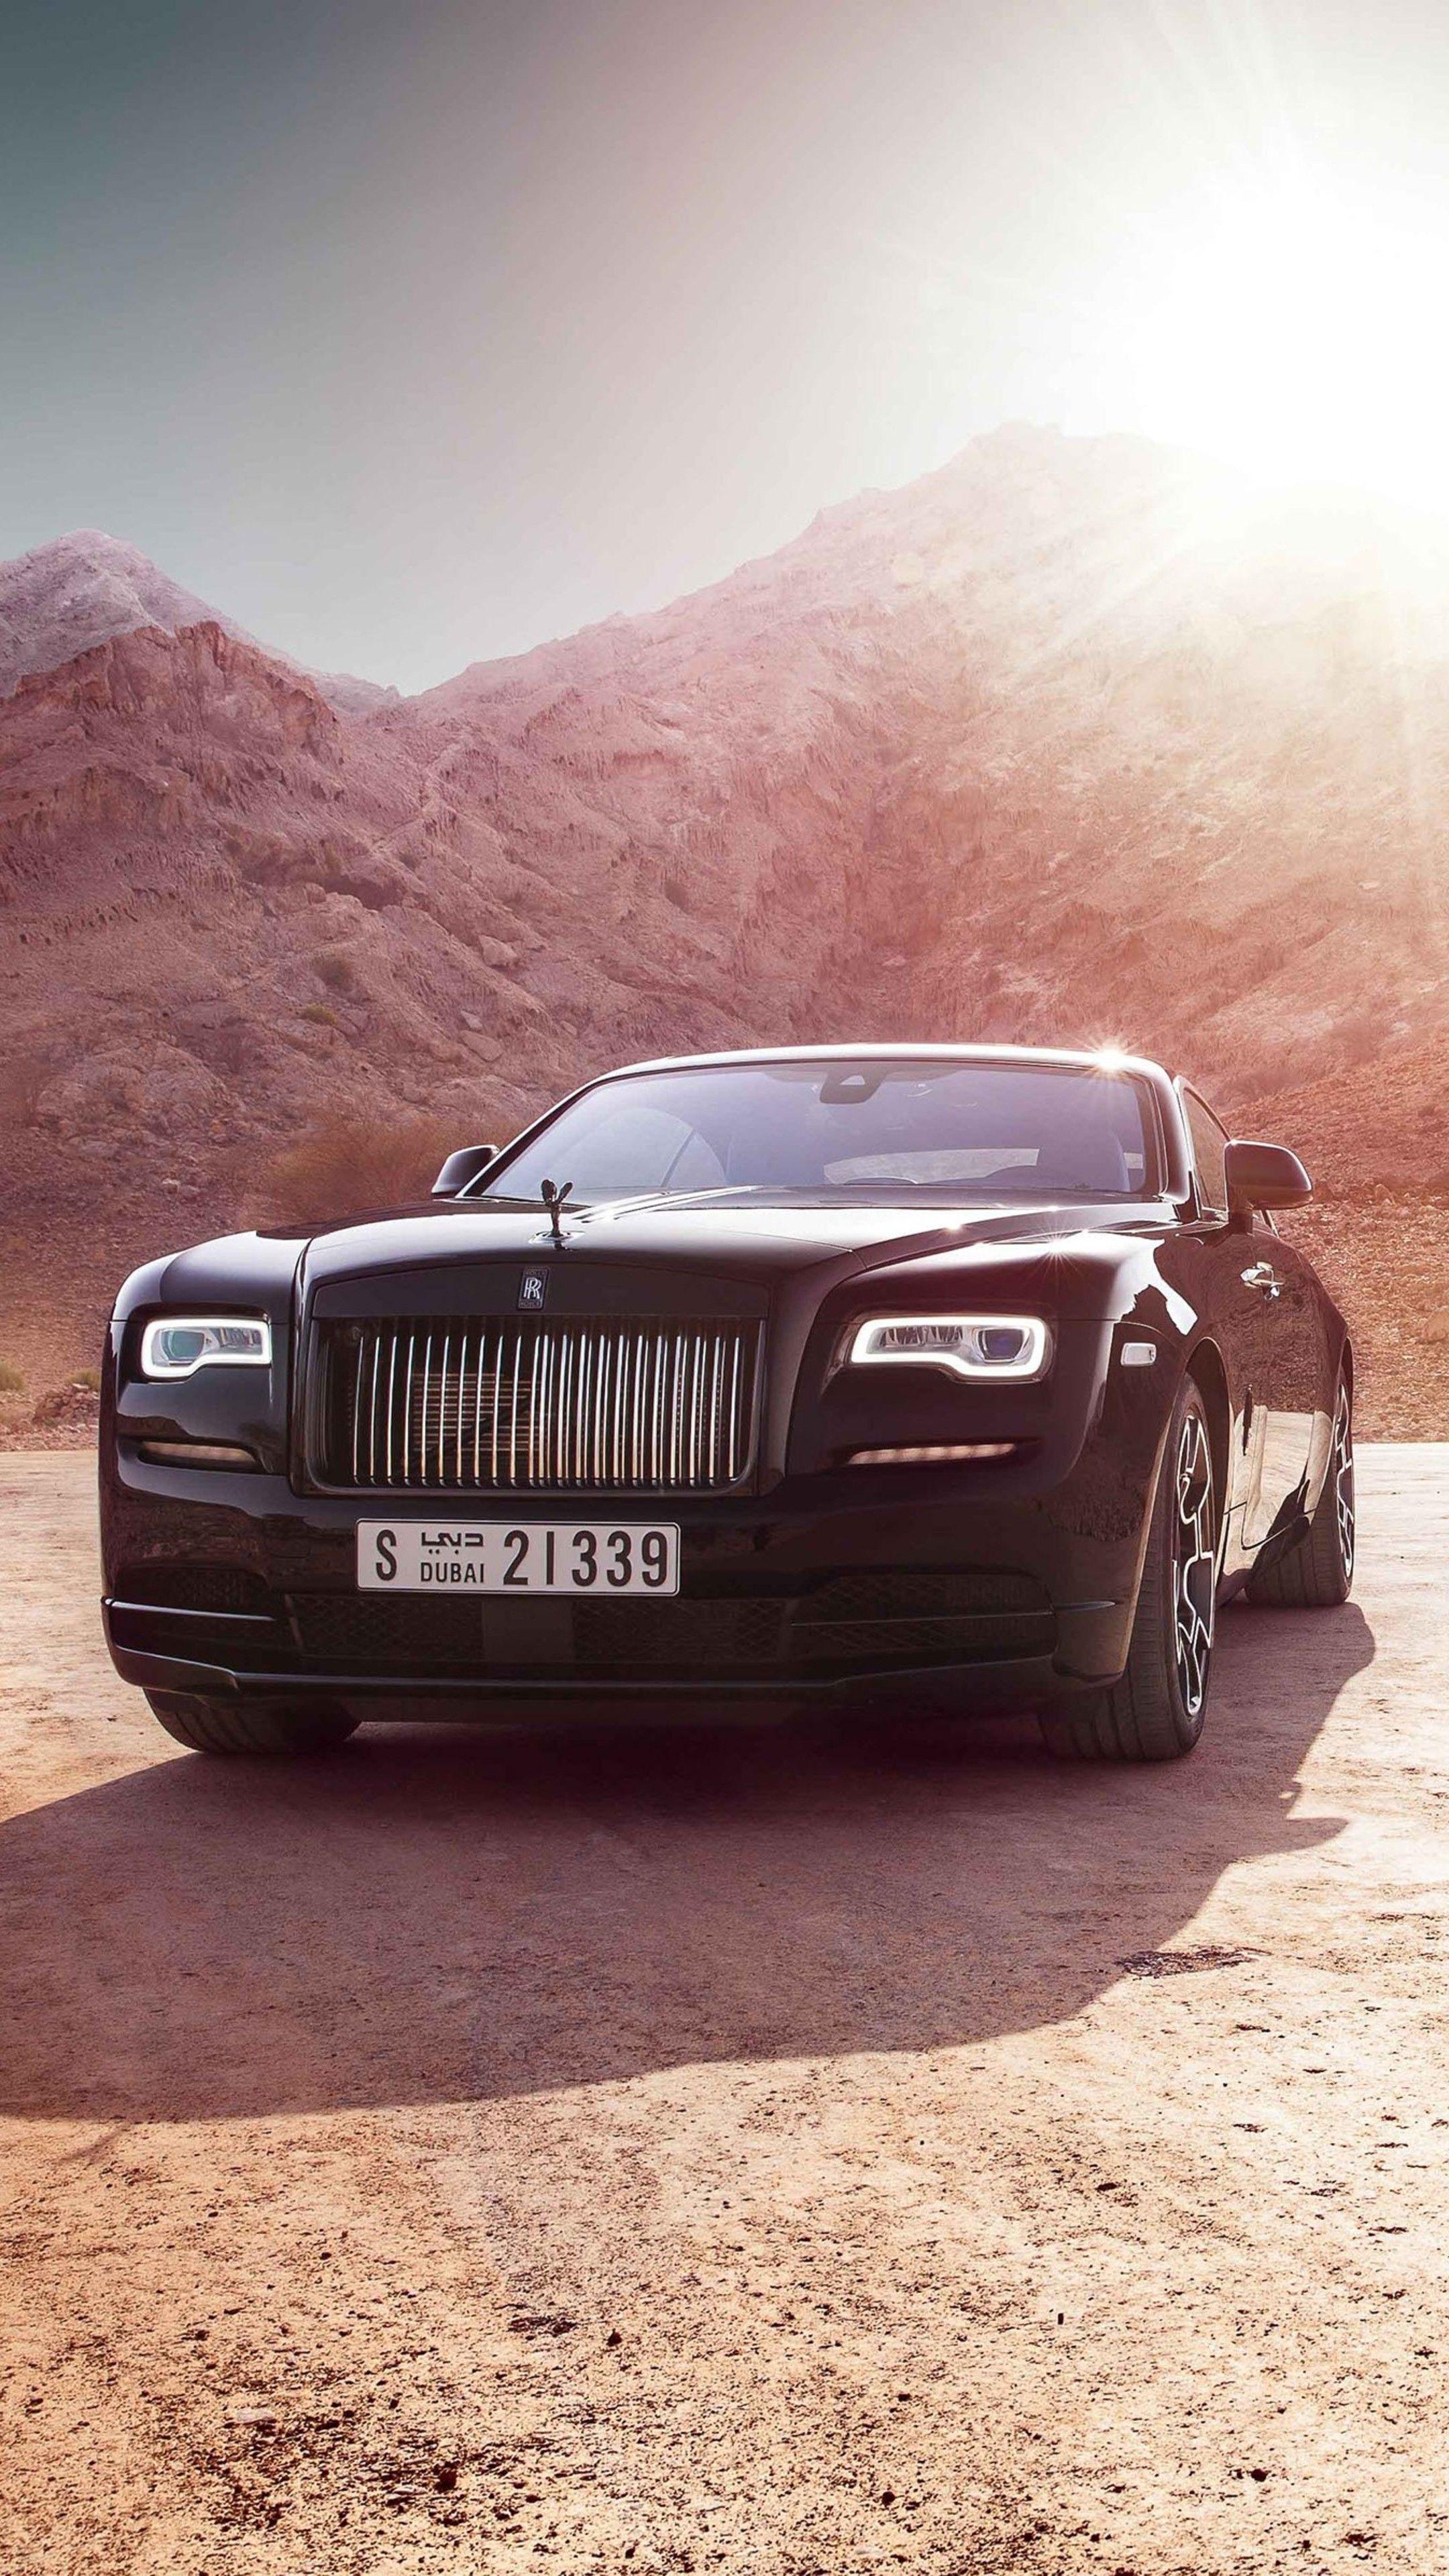 Cars Rolls Royce Wraith Black Badge 4k Wallpapers Luxury Cars Rolls Royce Rolls Royce Wraith Black Rolls Royce